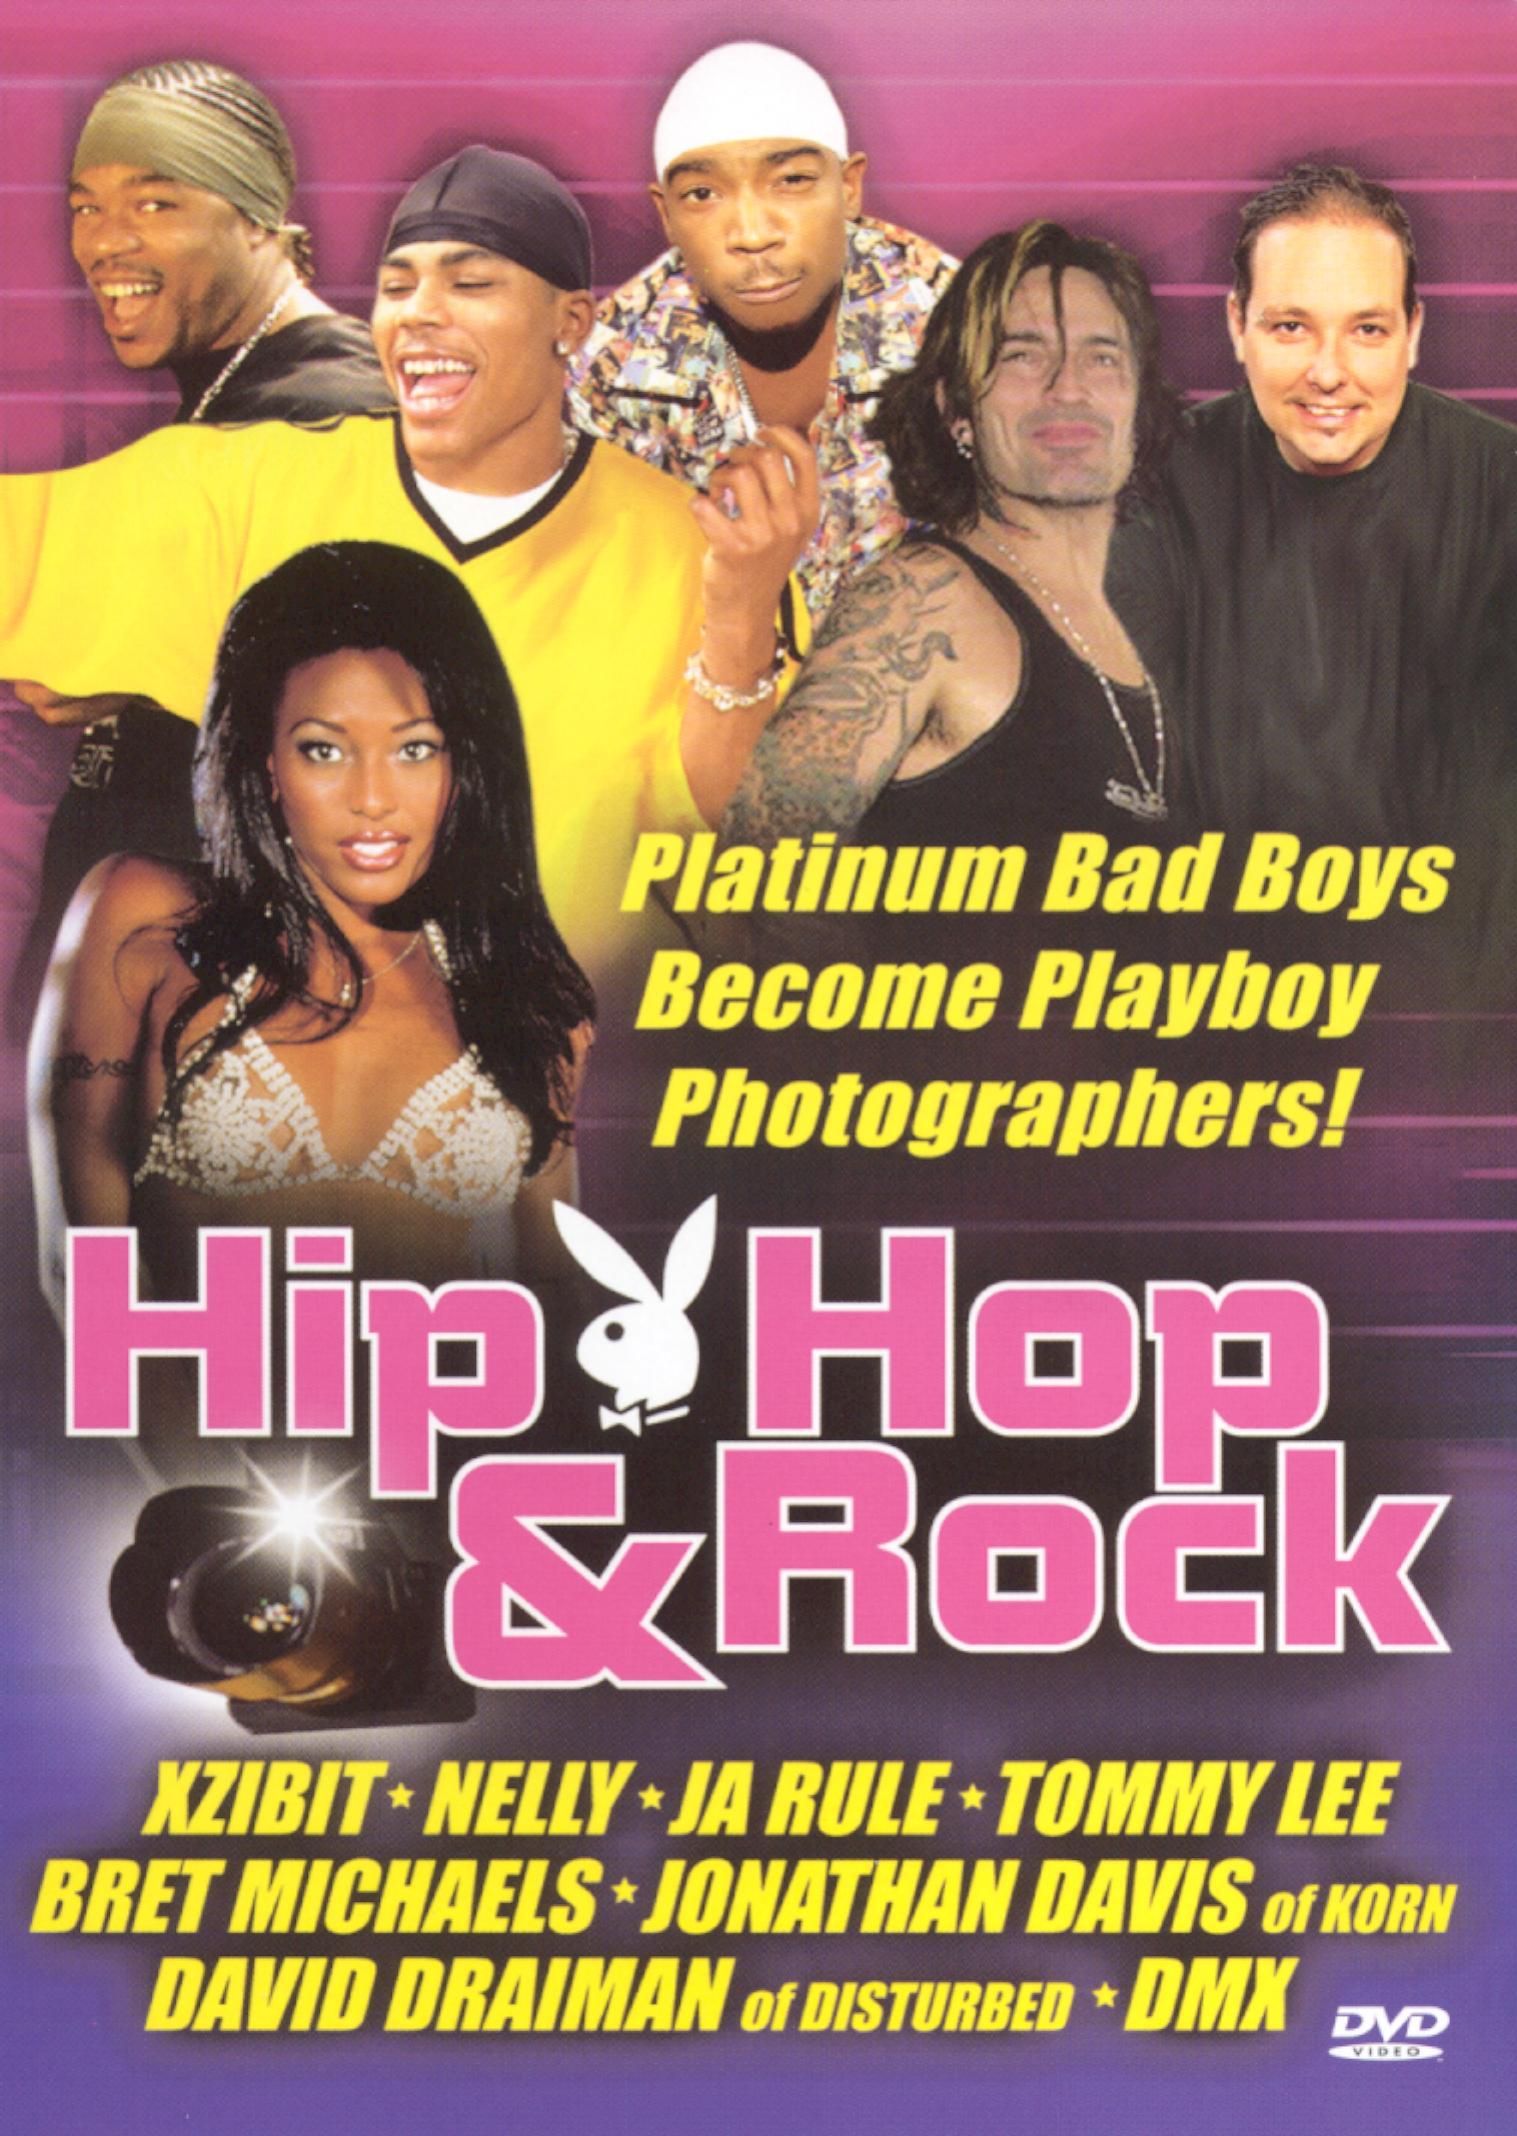 Playboy: Shooting Stars - Hip Hop and Rock